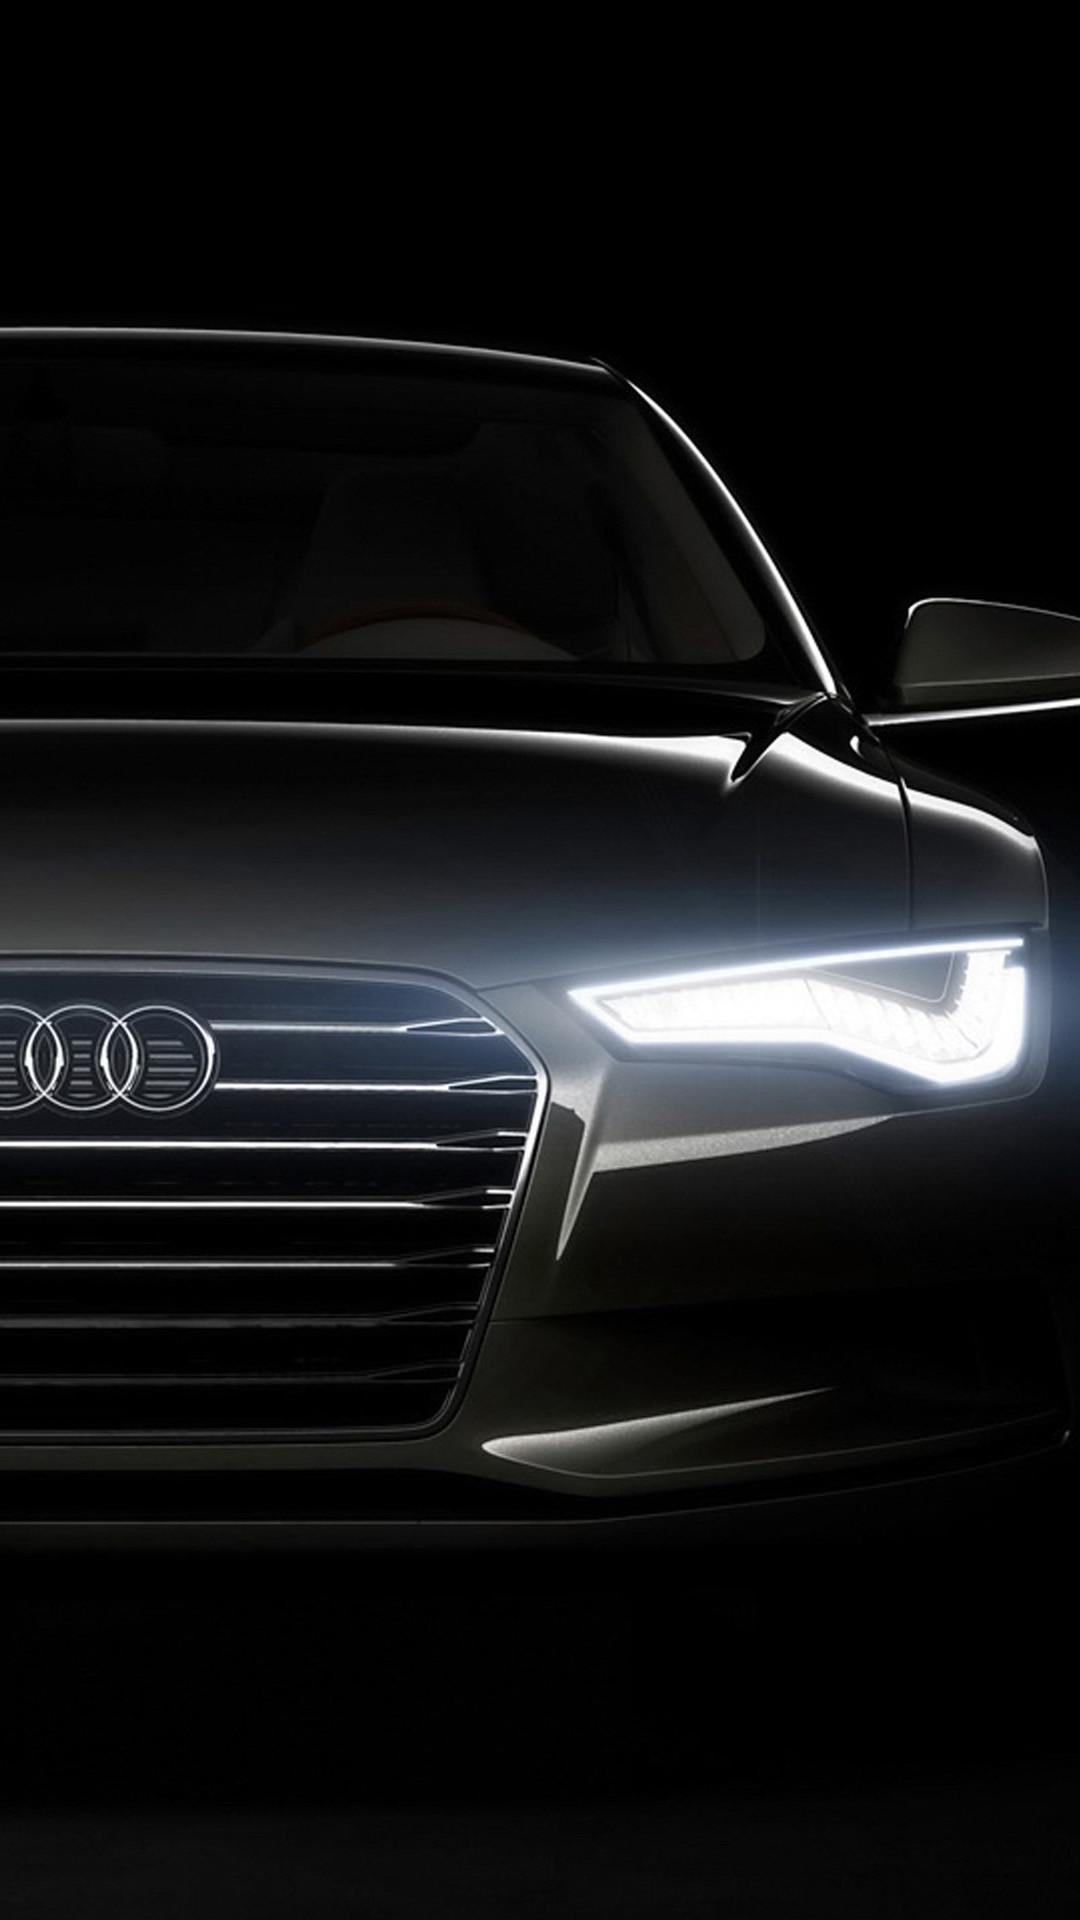 Audi Logo Hd Iphone Wallpapers Wallpaper Cave